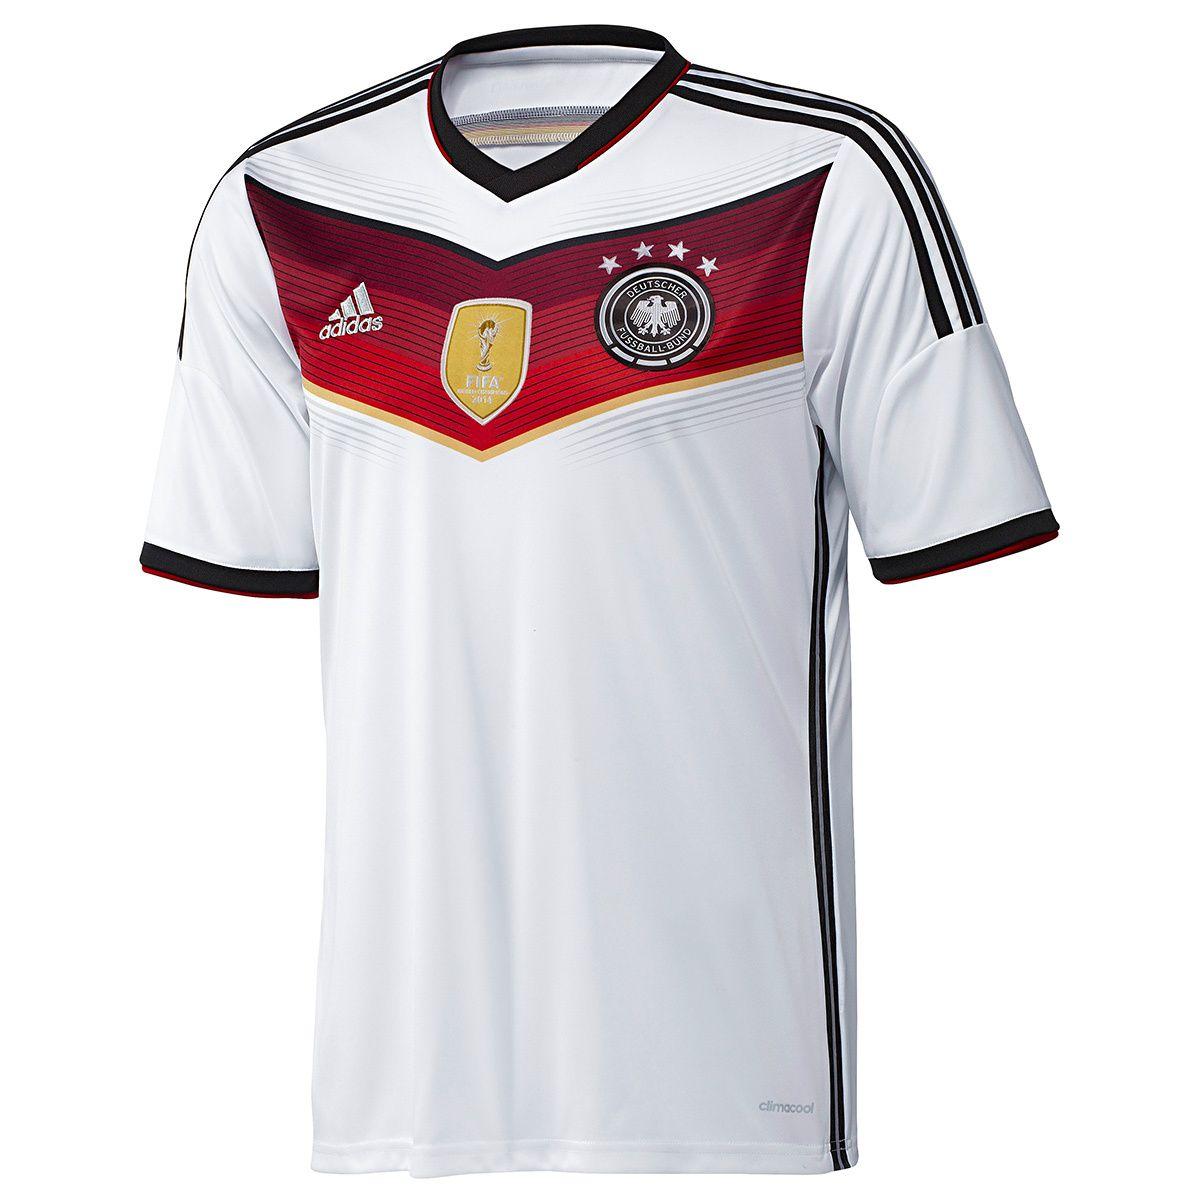 Germany World Cup Winners Junior Shirt Soccer Shirts Soccer Jersey World Cup Jerseys